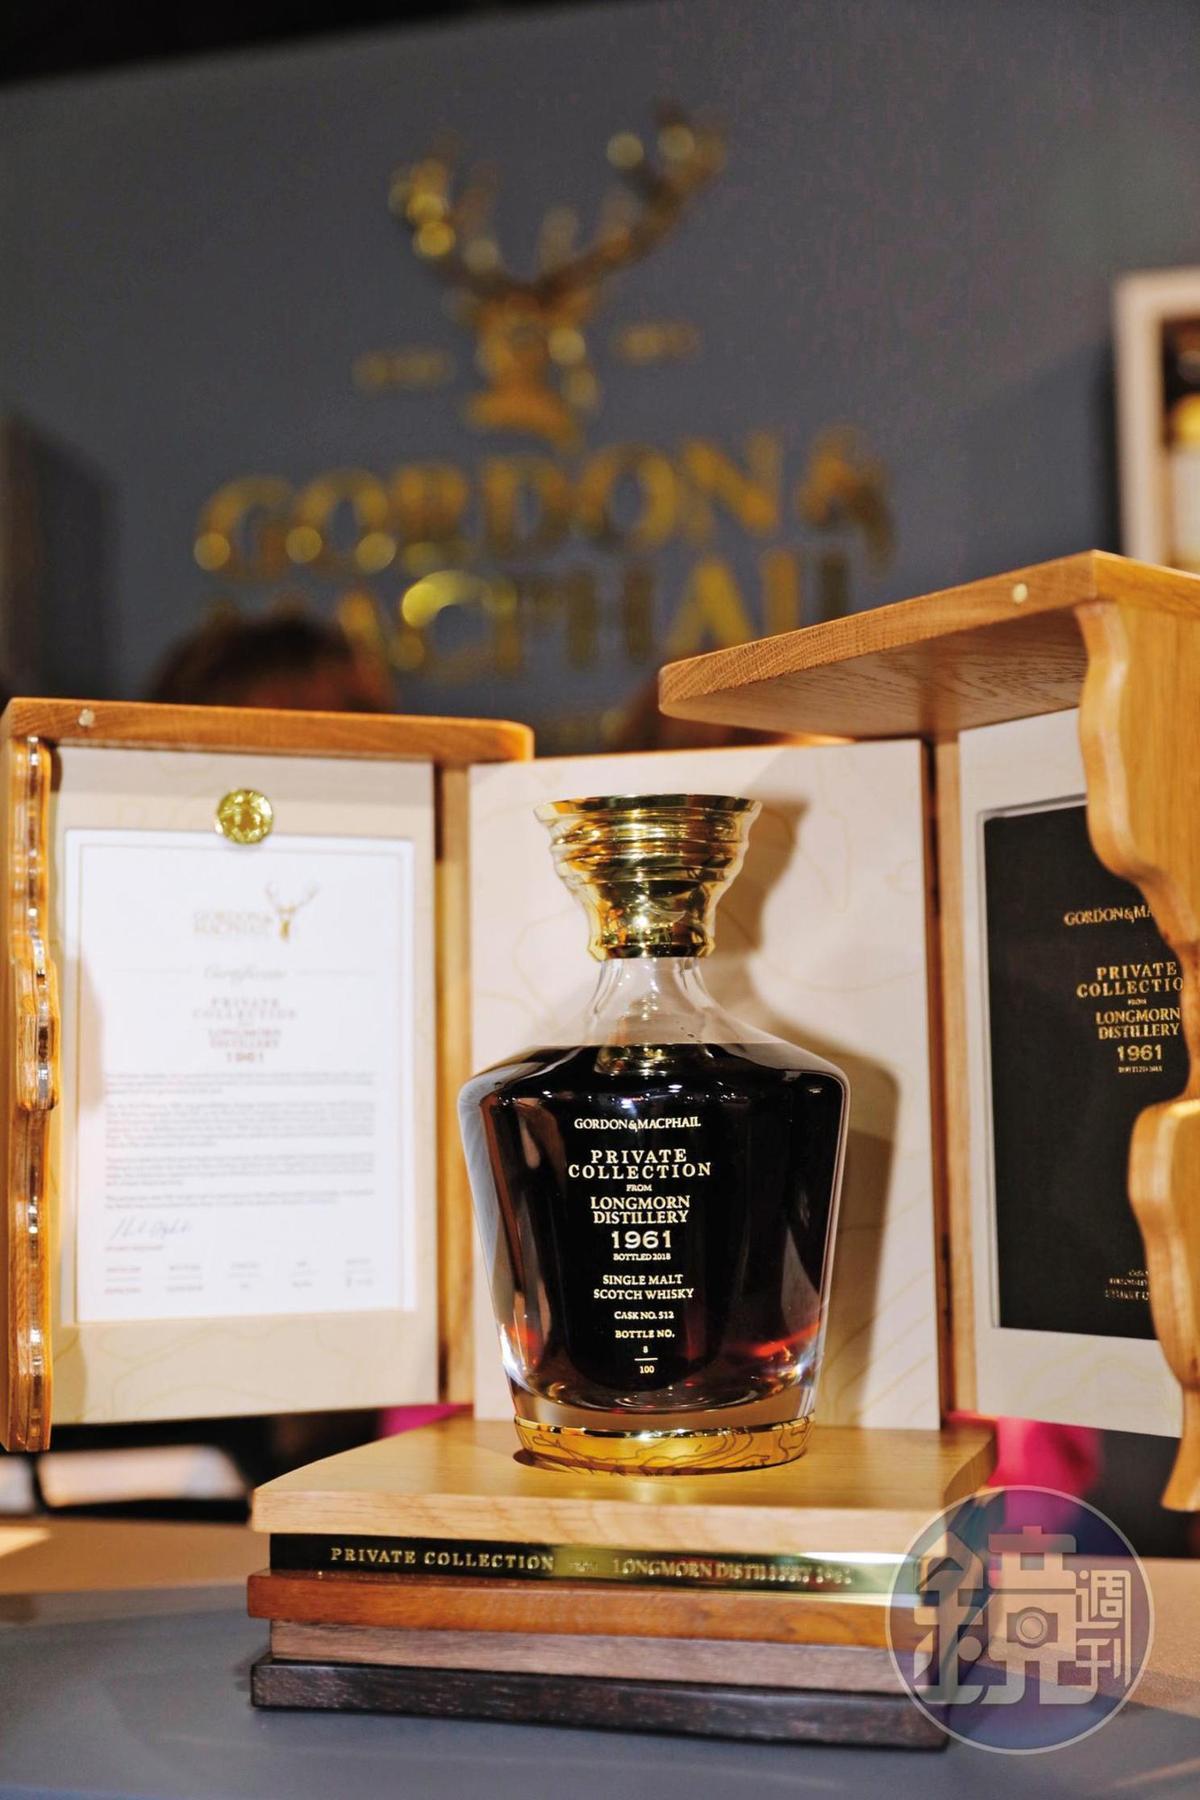 Gordon & Macphail裝瓶的珍稀1961年Longmorn威士忌,現在當然只給你看,不可能給你喝。